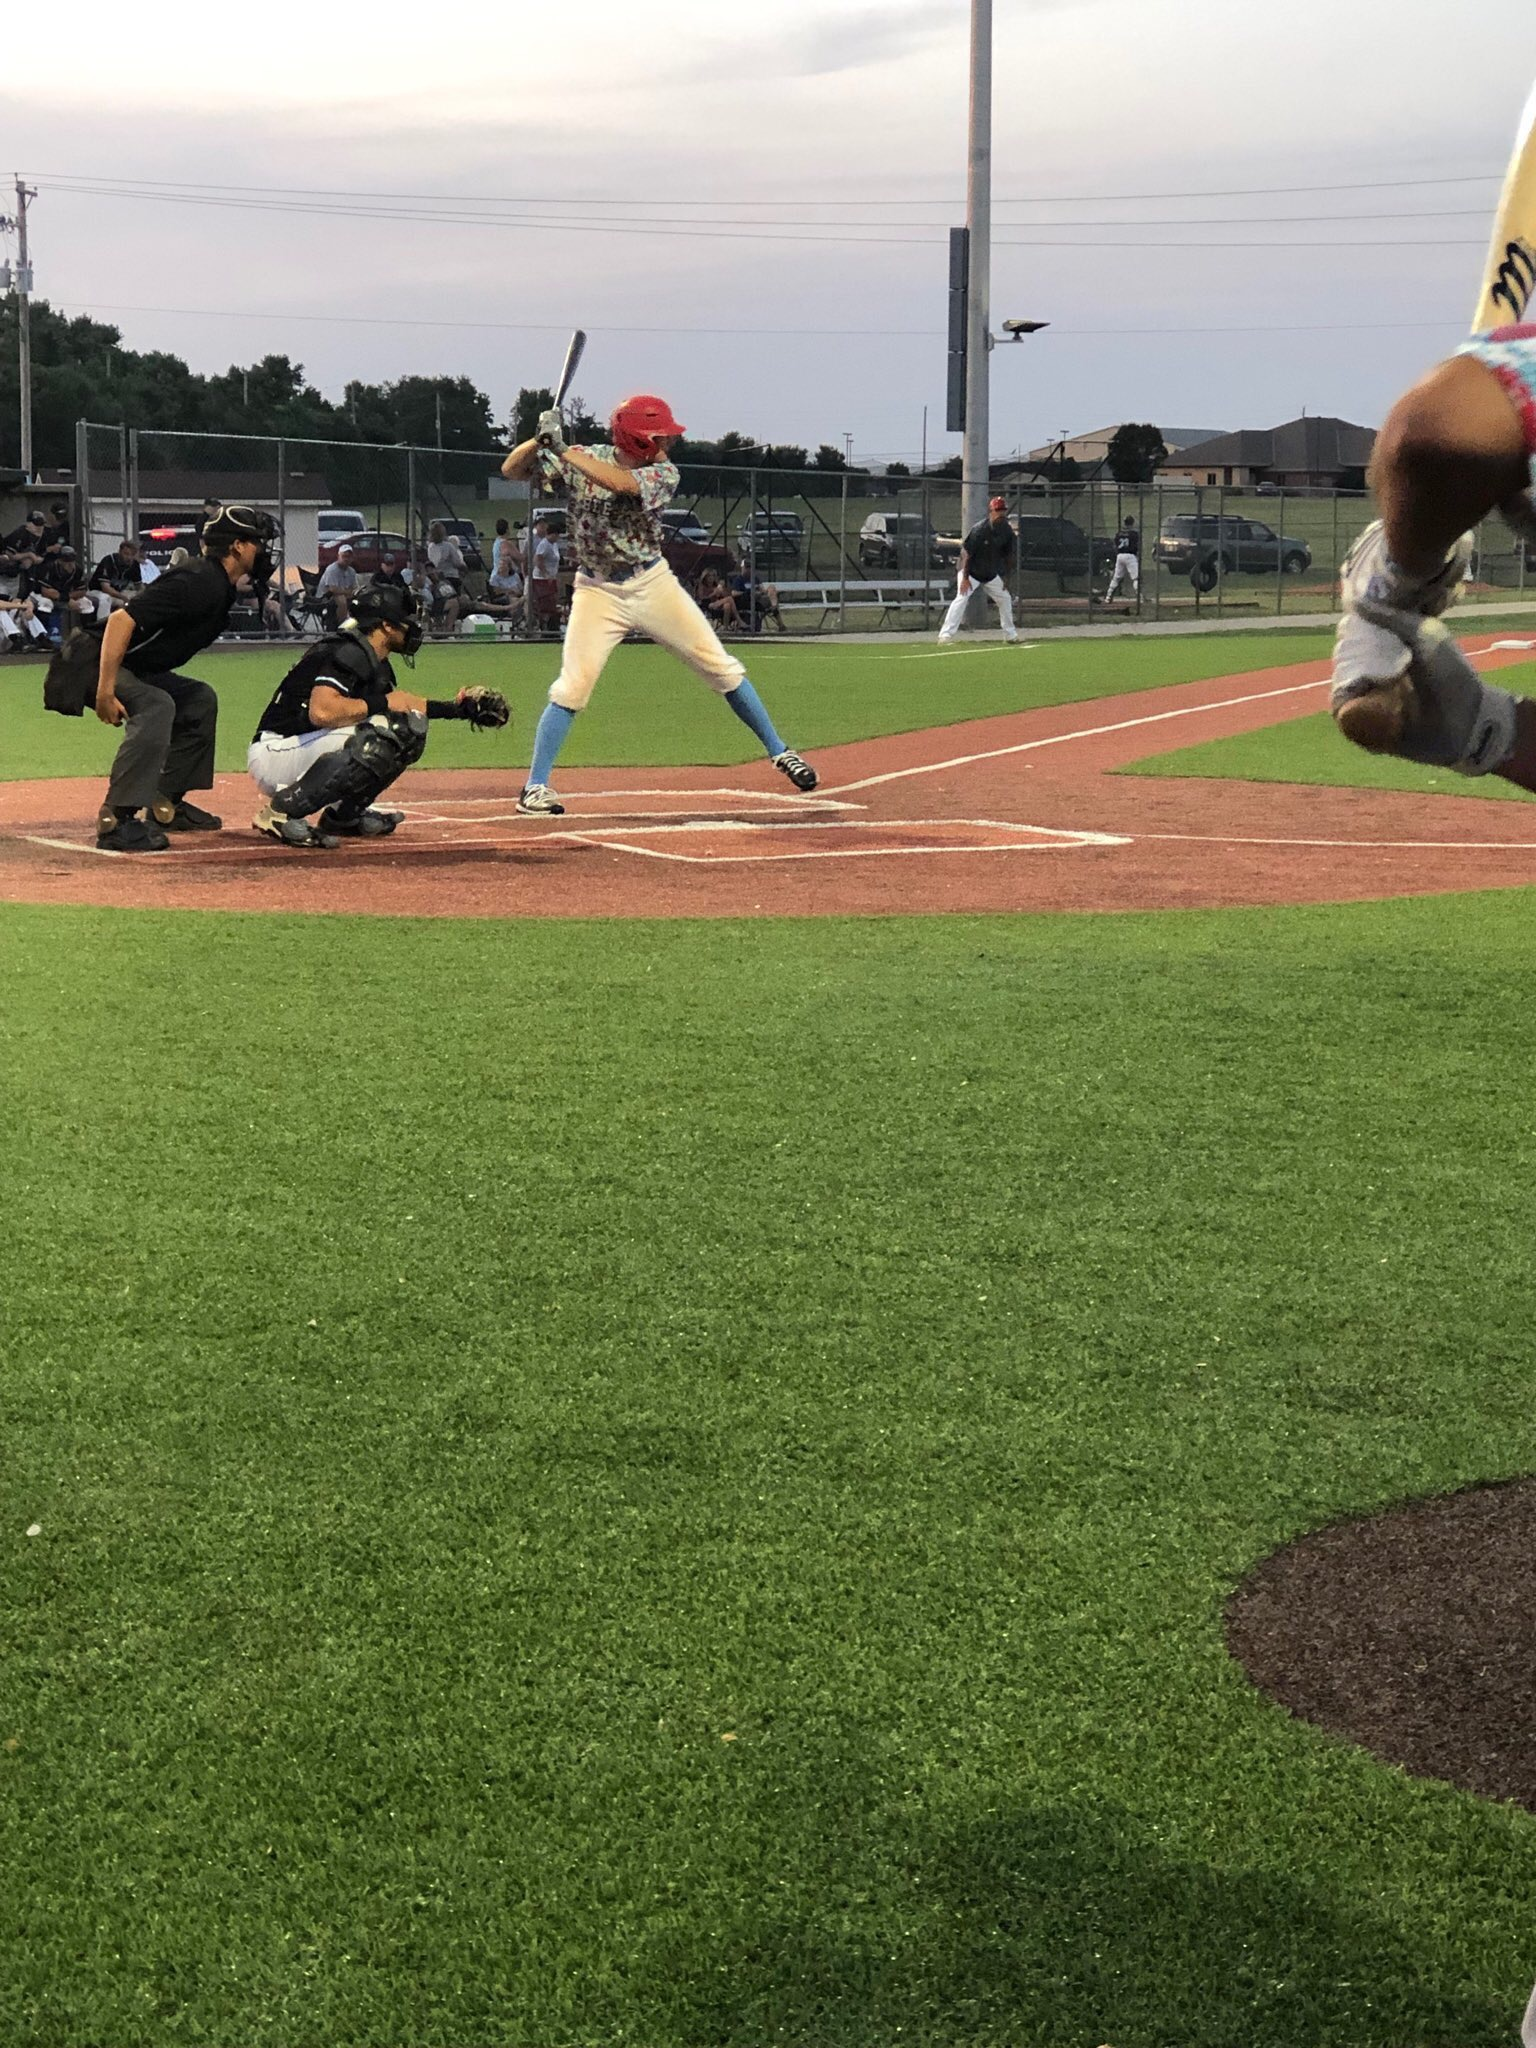 Bee Jays Take Game One of KCLB Series